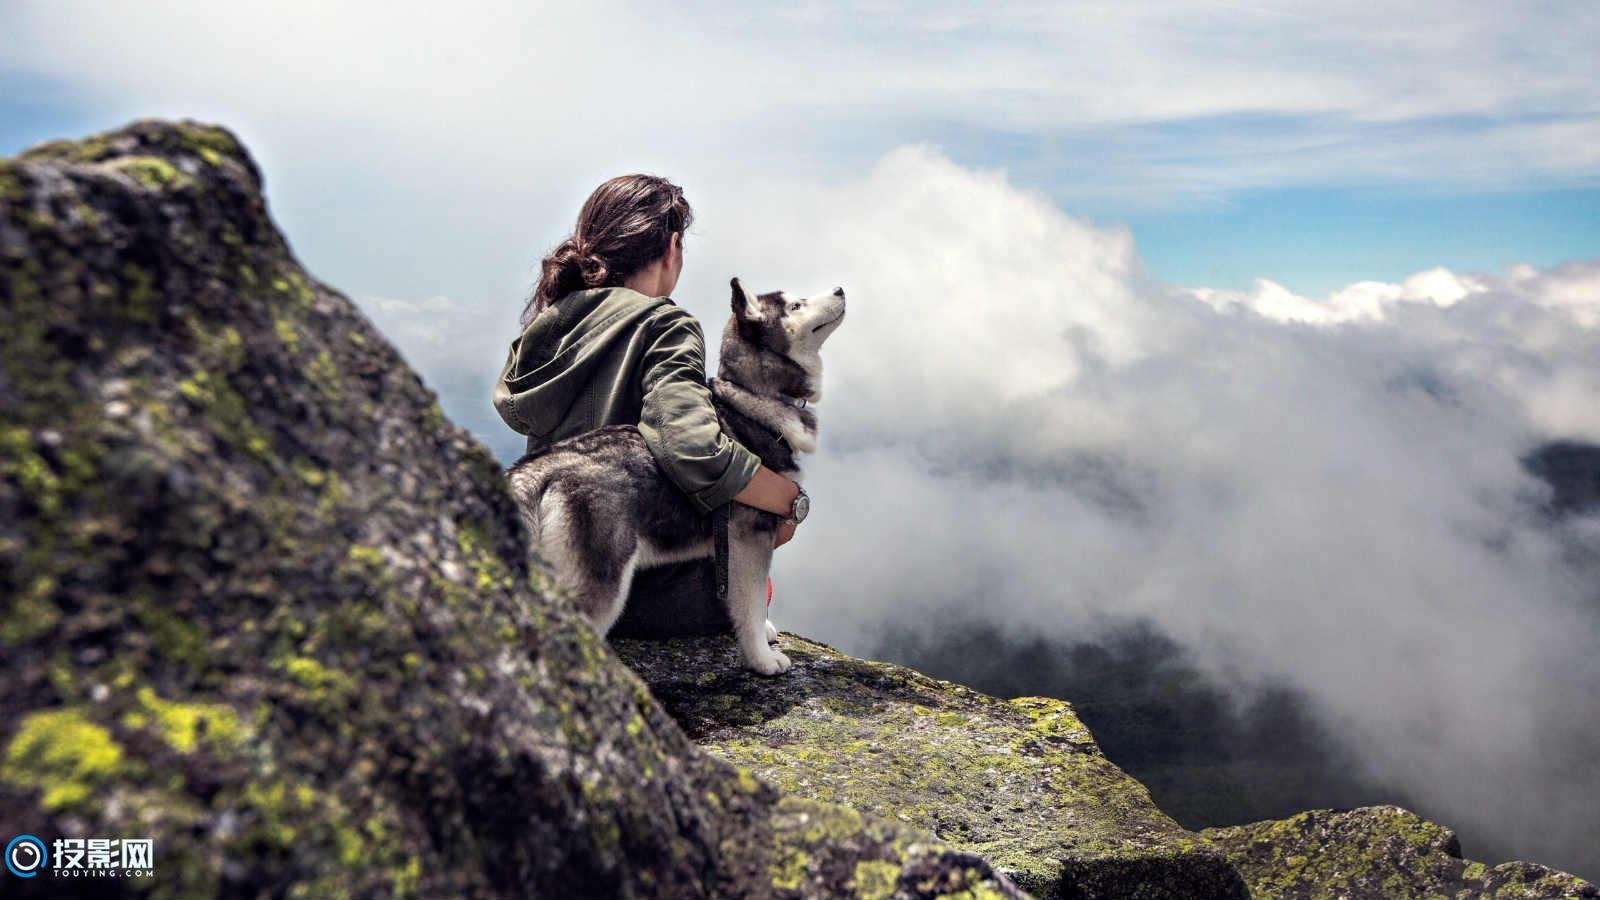 5K 美女和狗图片8P [分辨率5120x2880x21.9MB]